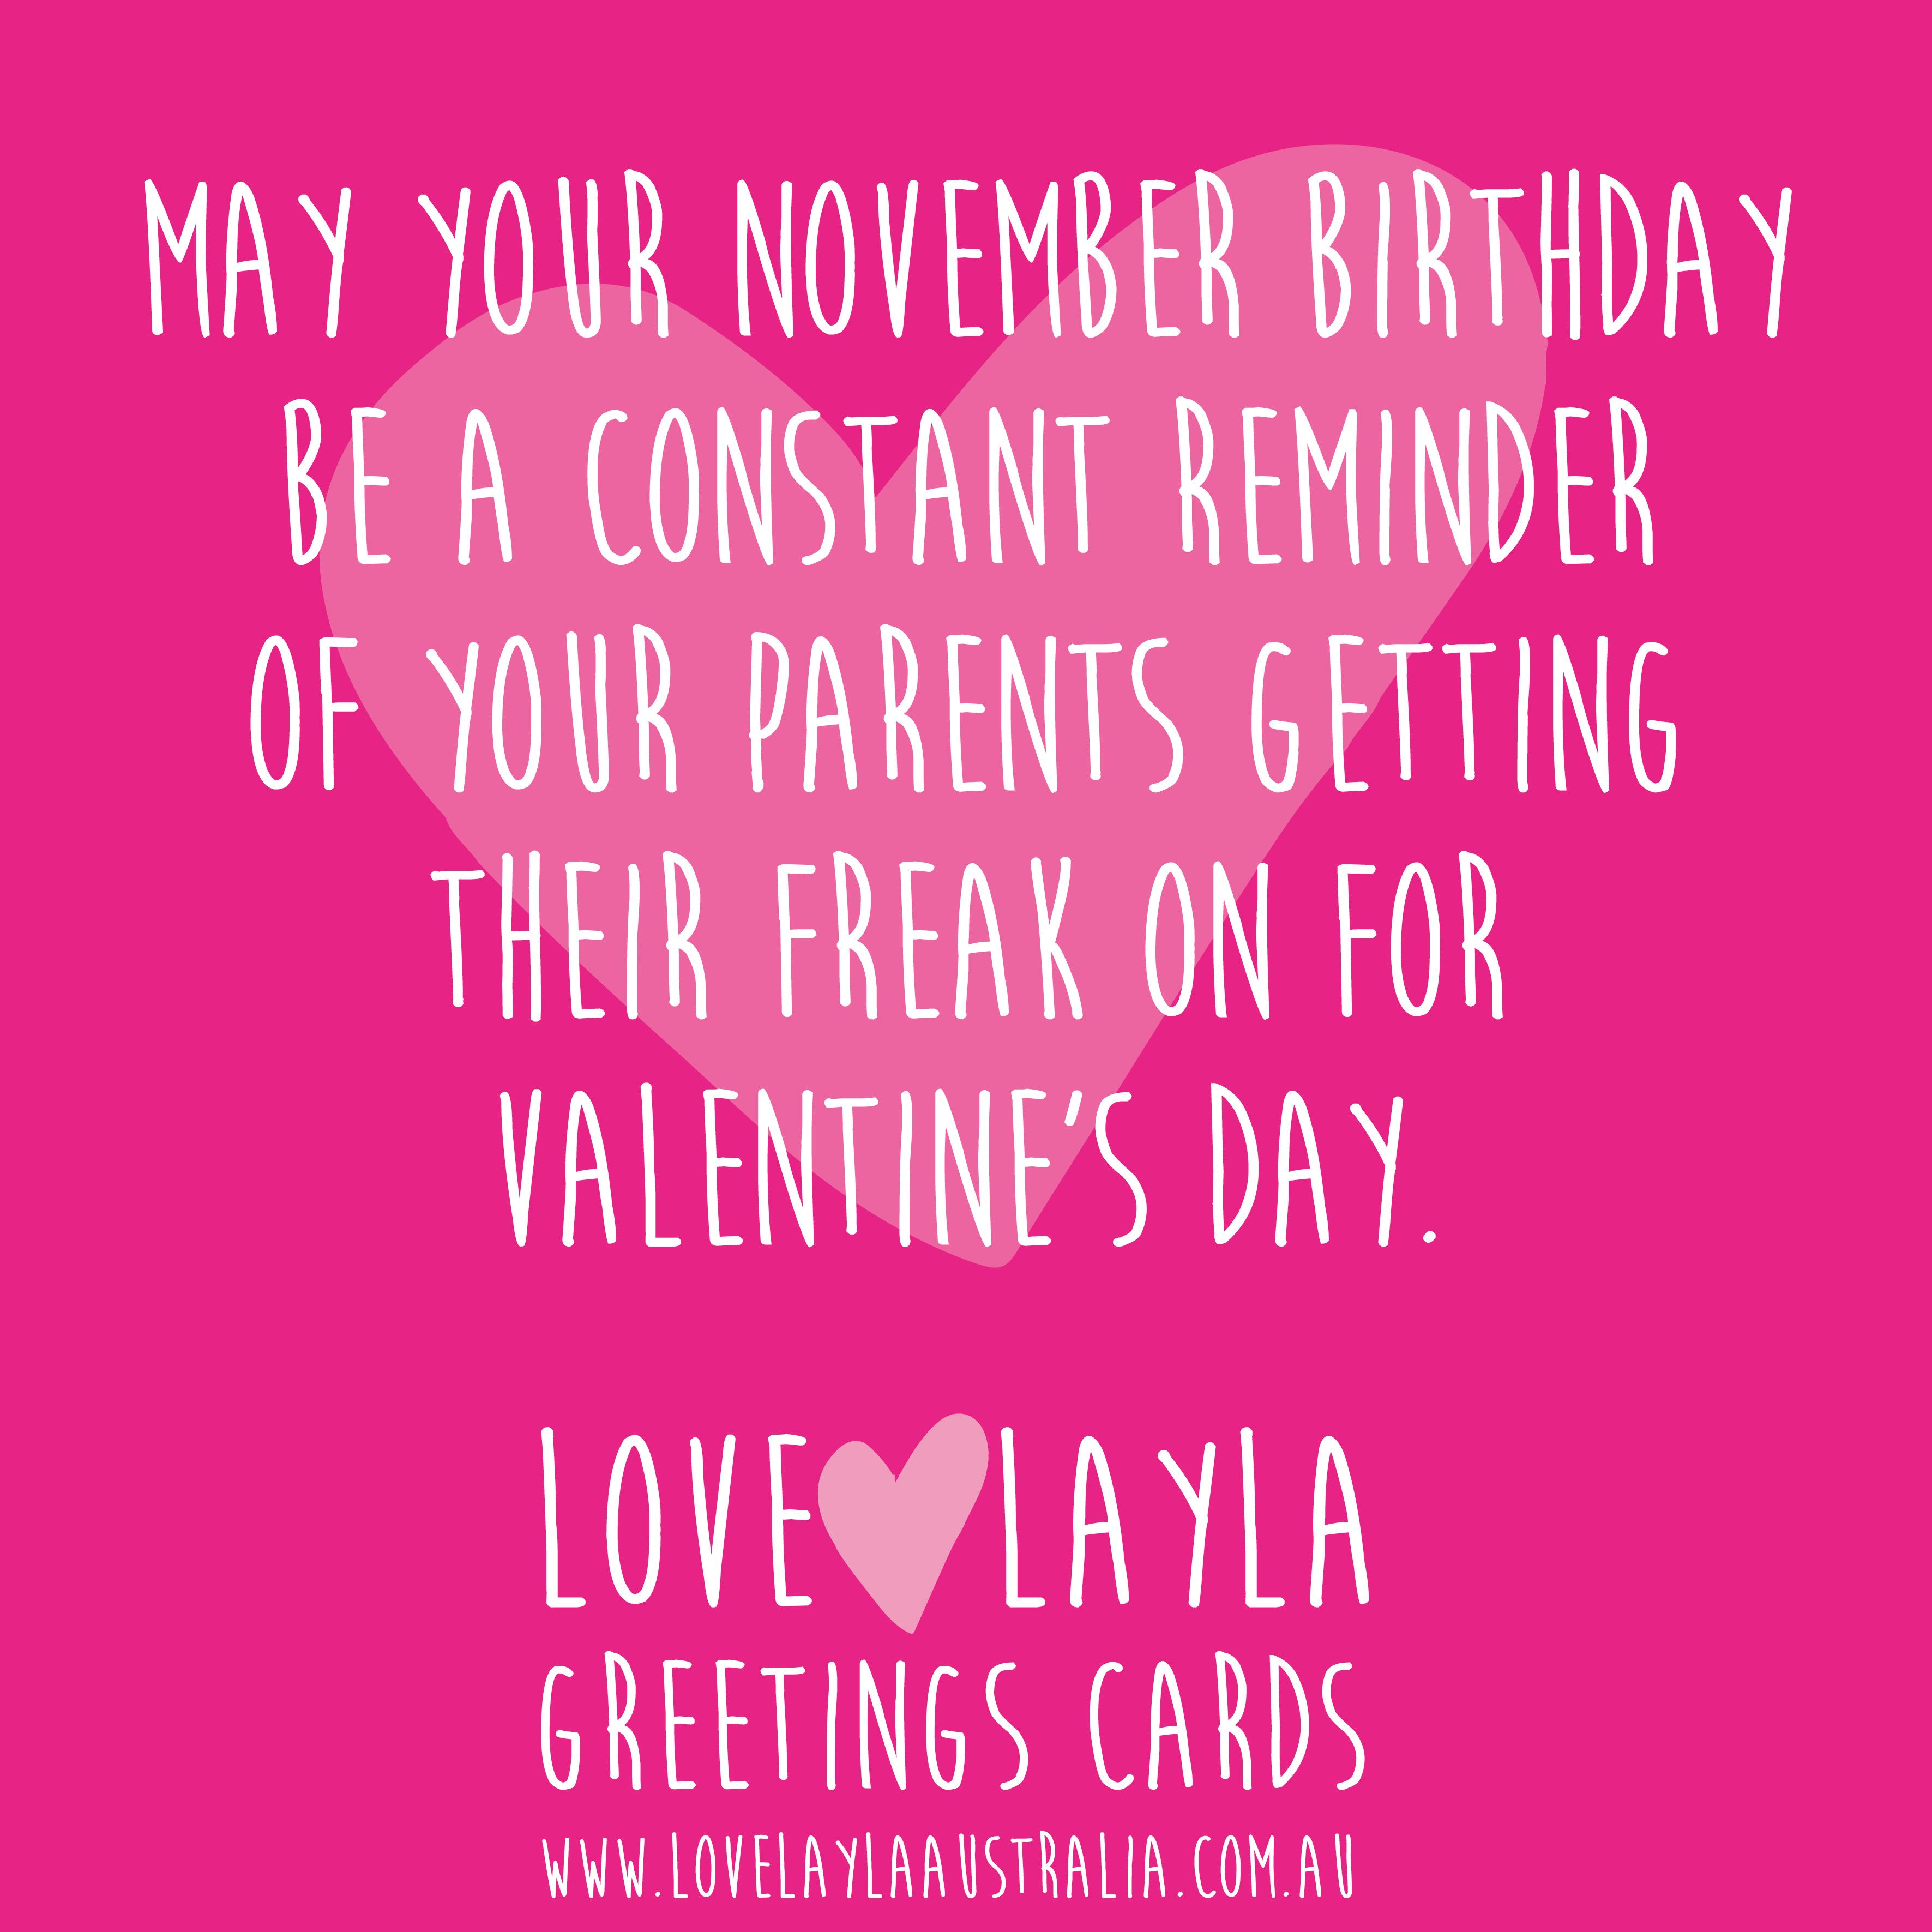 Get Your Freak On Reminder Remember Mumanddad Sexytime Getyourfreakon Valentines Happy Valentines Day Funny Valentines Day Funny Meme Happy Sibling Day